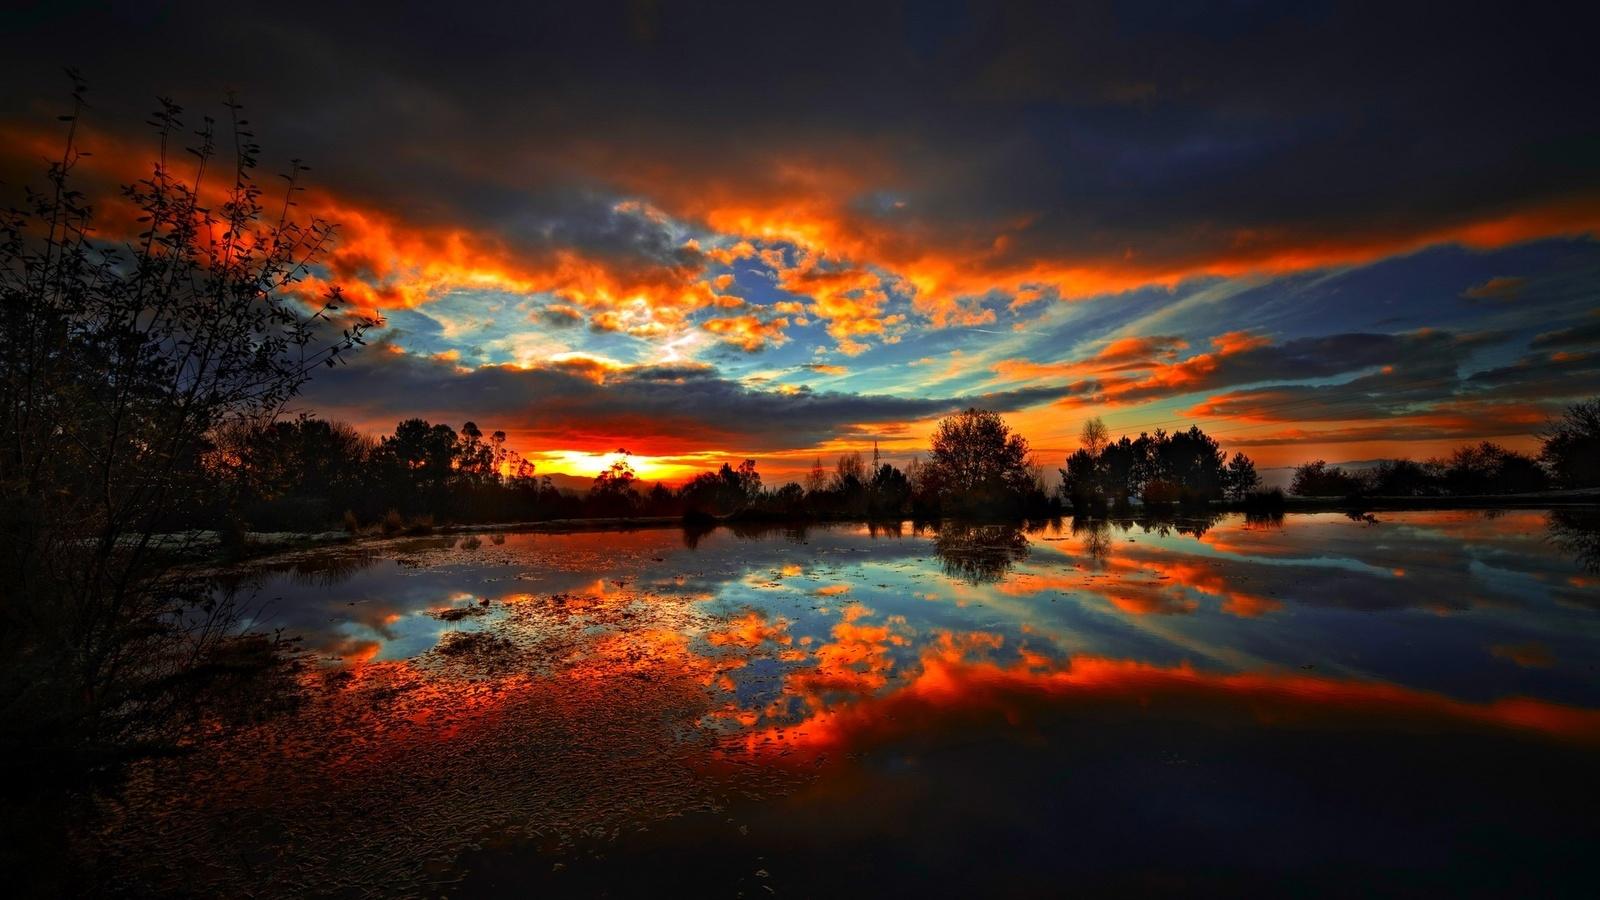 Картинки для, вечерний закат картинки